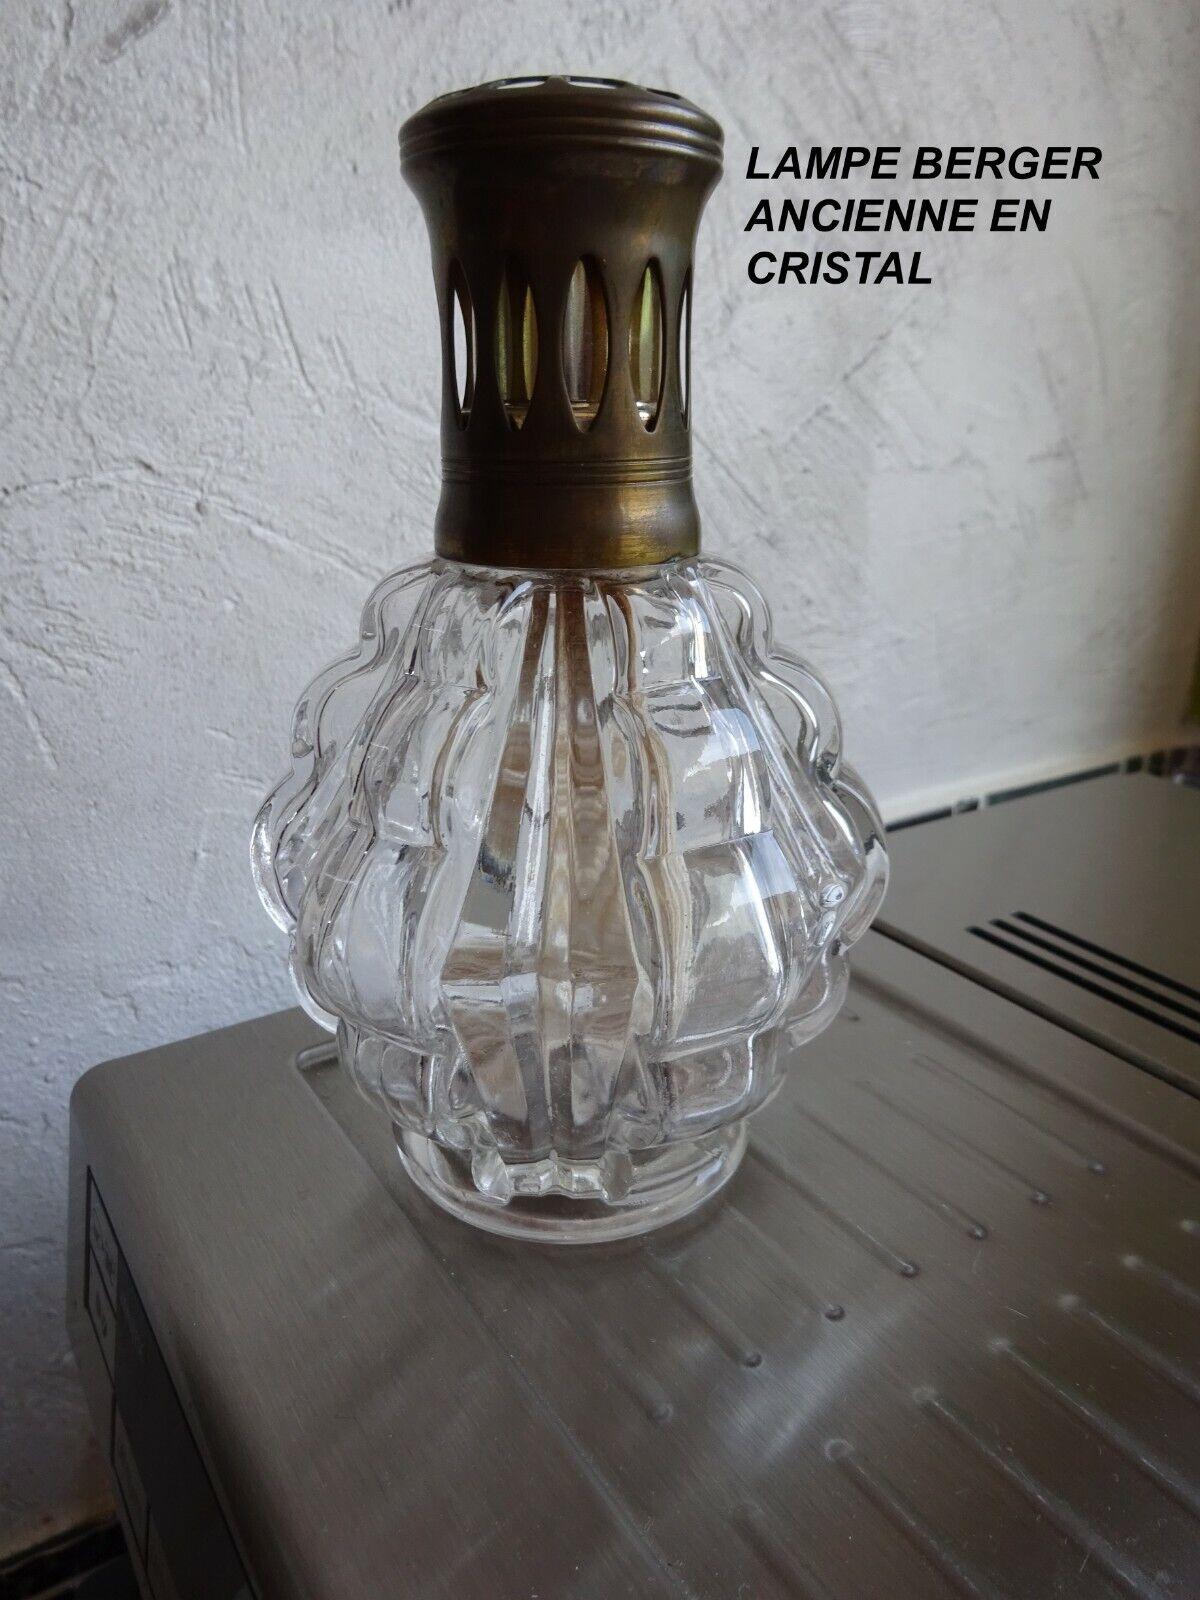 ANCIENNE LAMPE BERGER EN VERRE CRISTAL TRANSPARENT